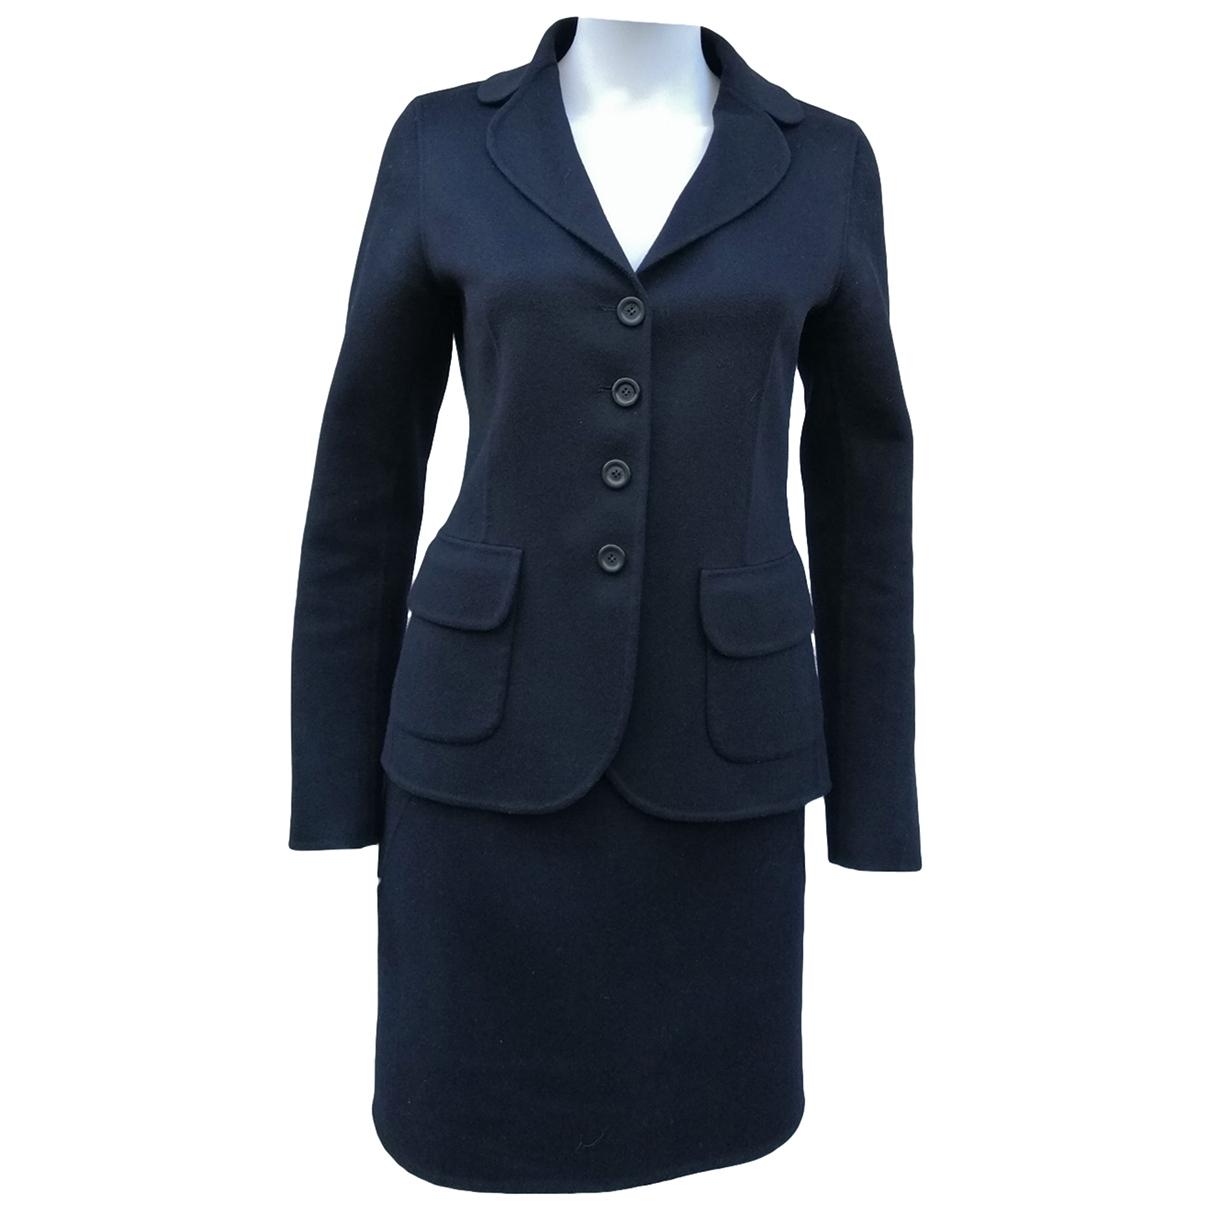 Celine \N Black Wool jacket for Women 36 FR